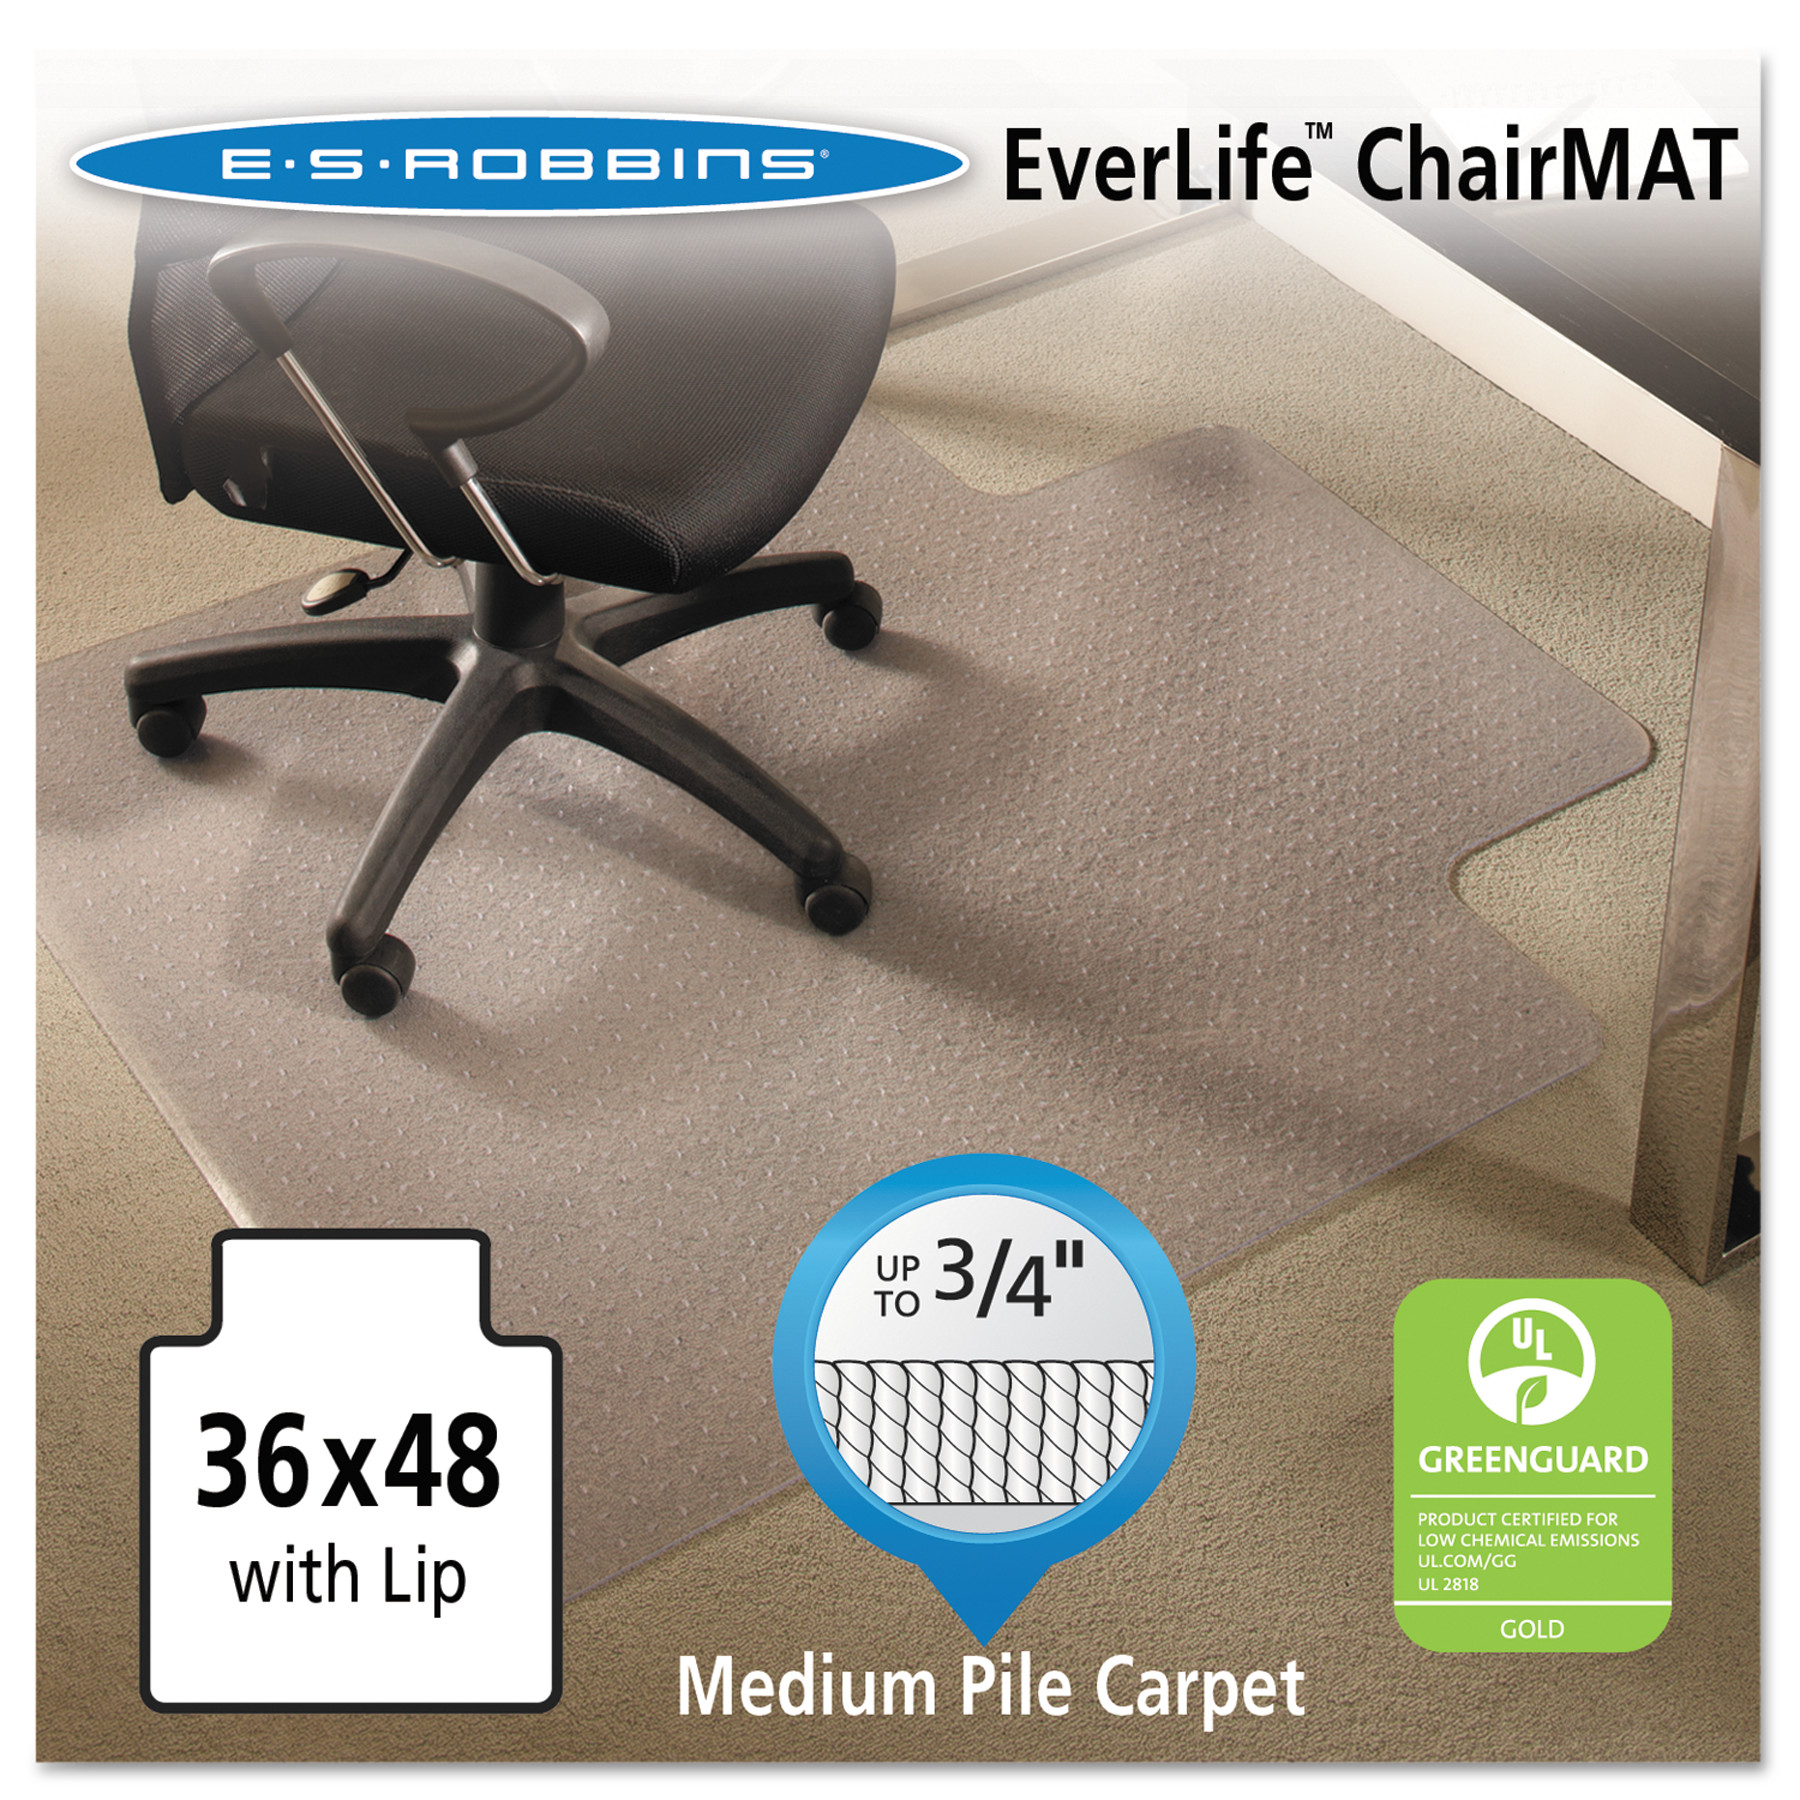 ES Robbins EverLife 36 x 48 Chair Mat for Medium Pile Carpet, Rectangular with Lip